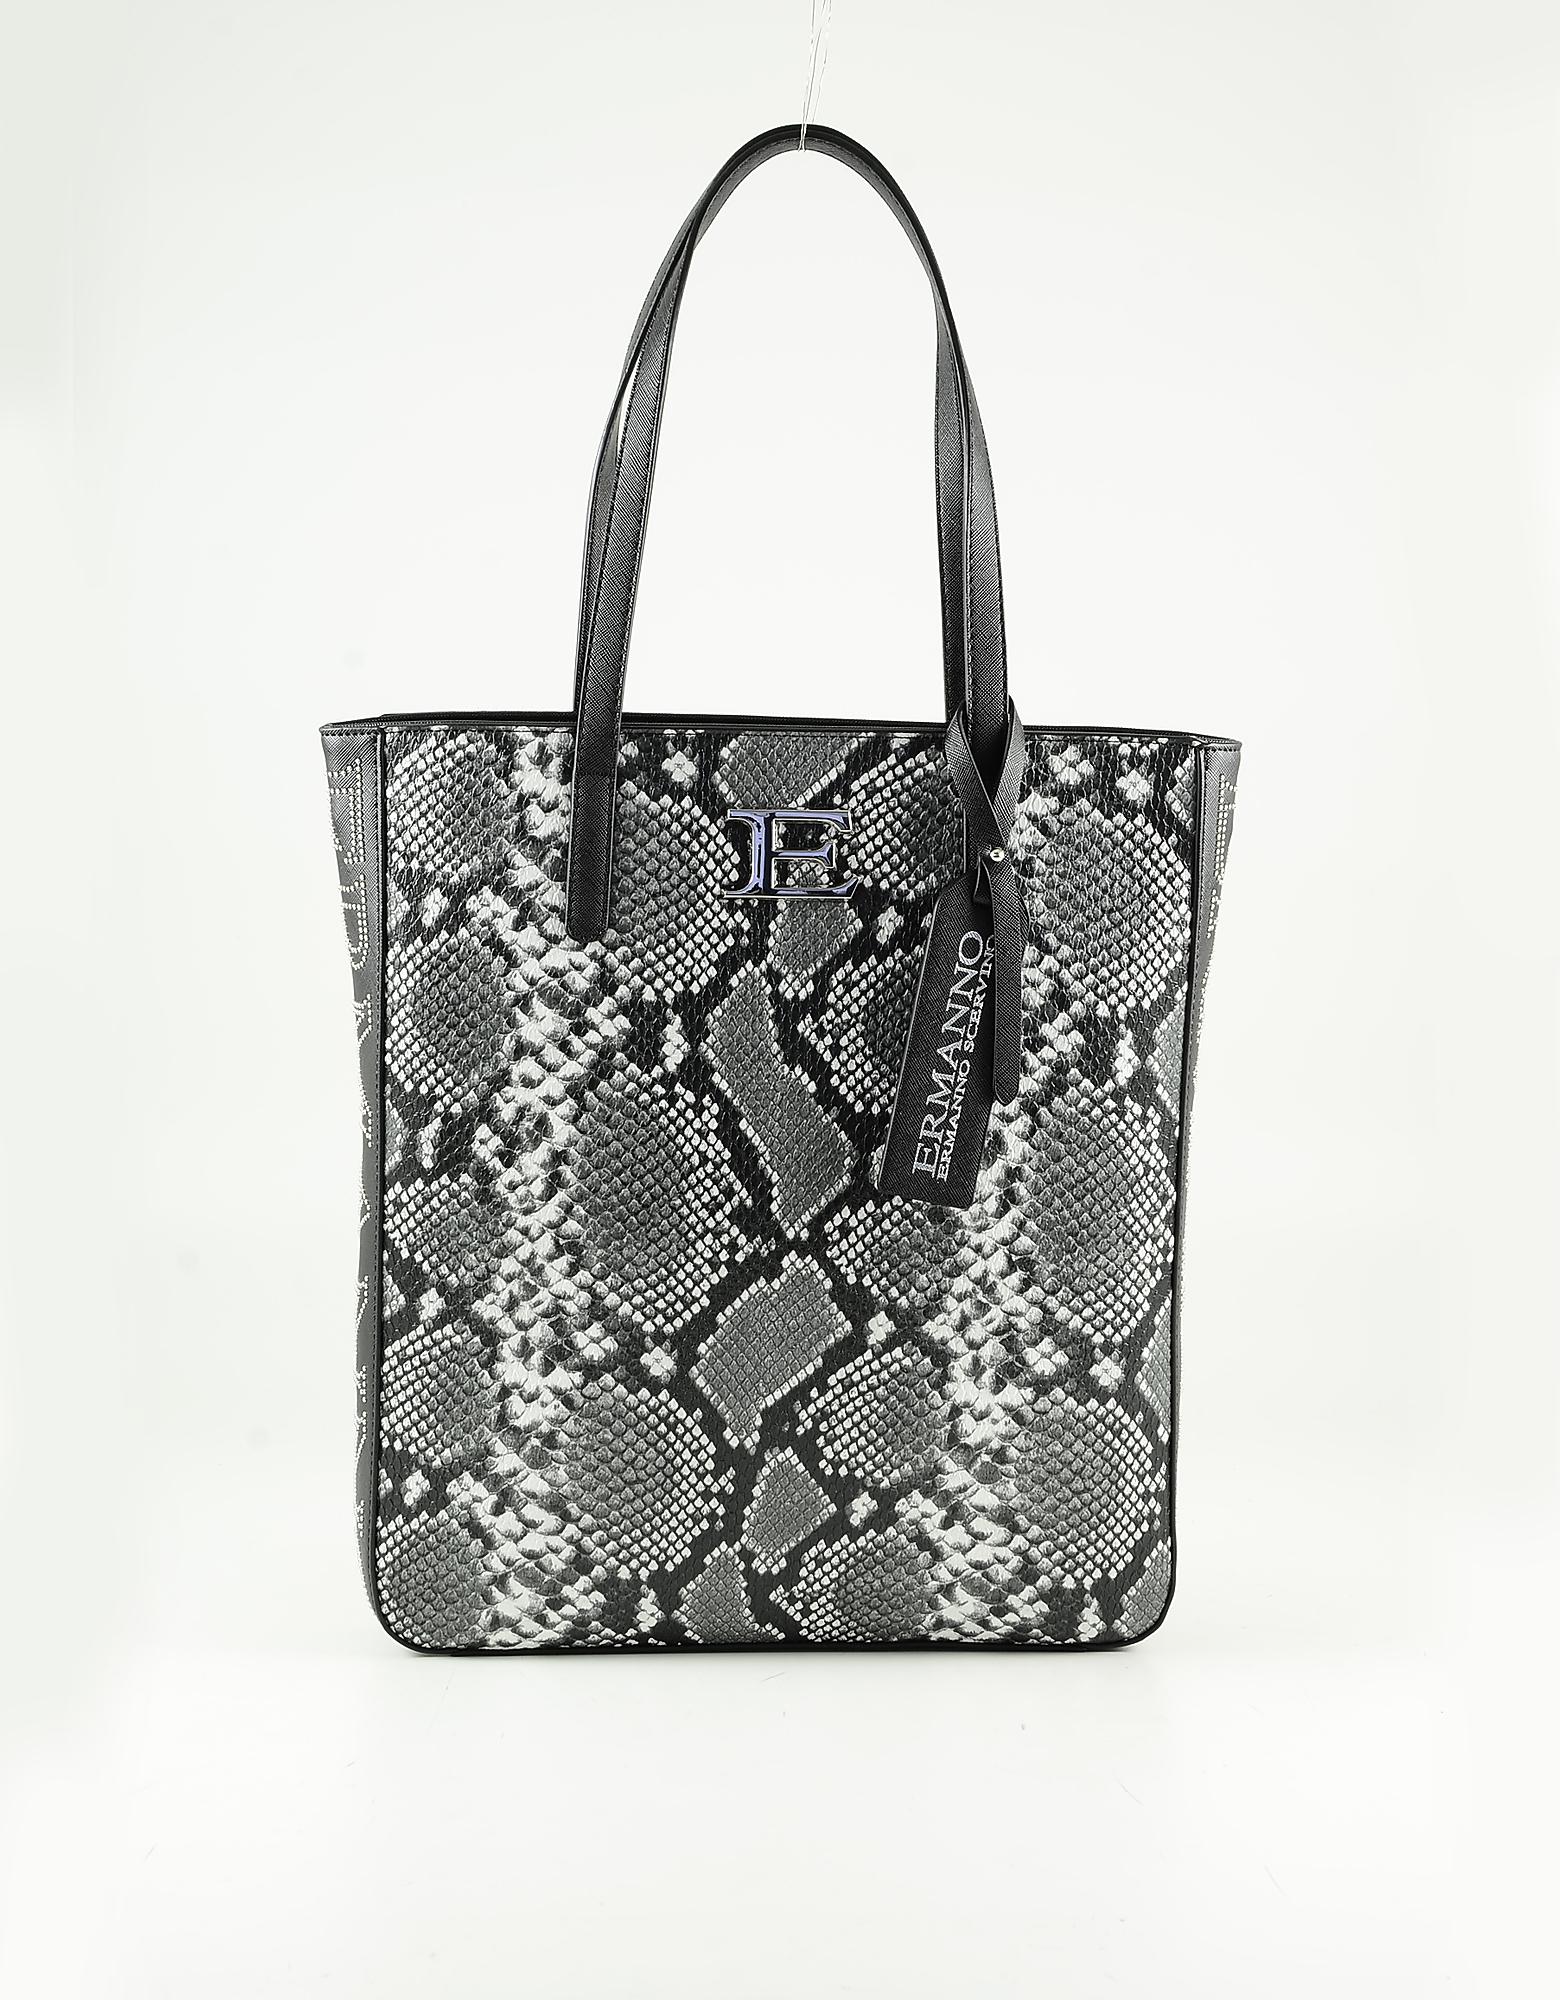 Ermanno Scervino Dark Gray Python Printed Eco Leather Tote Bag